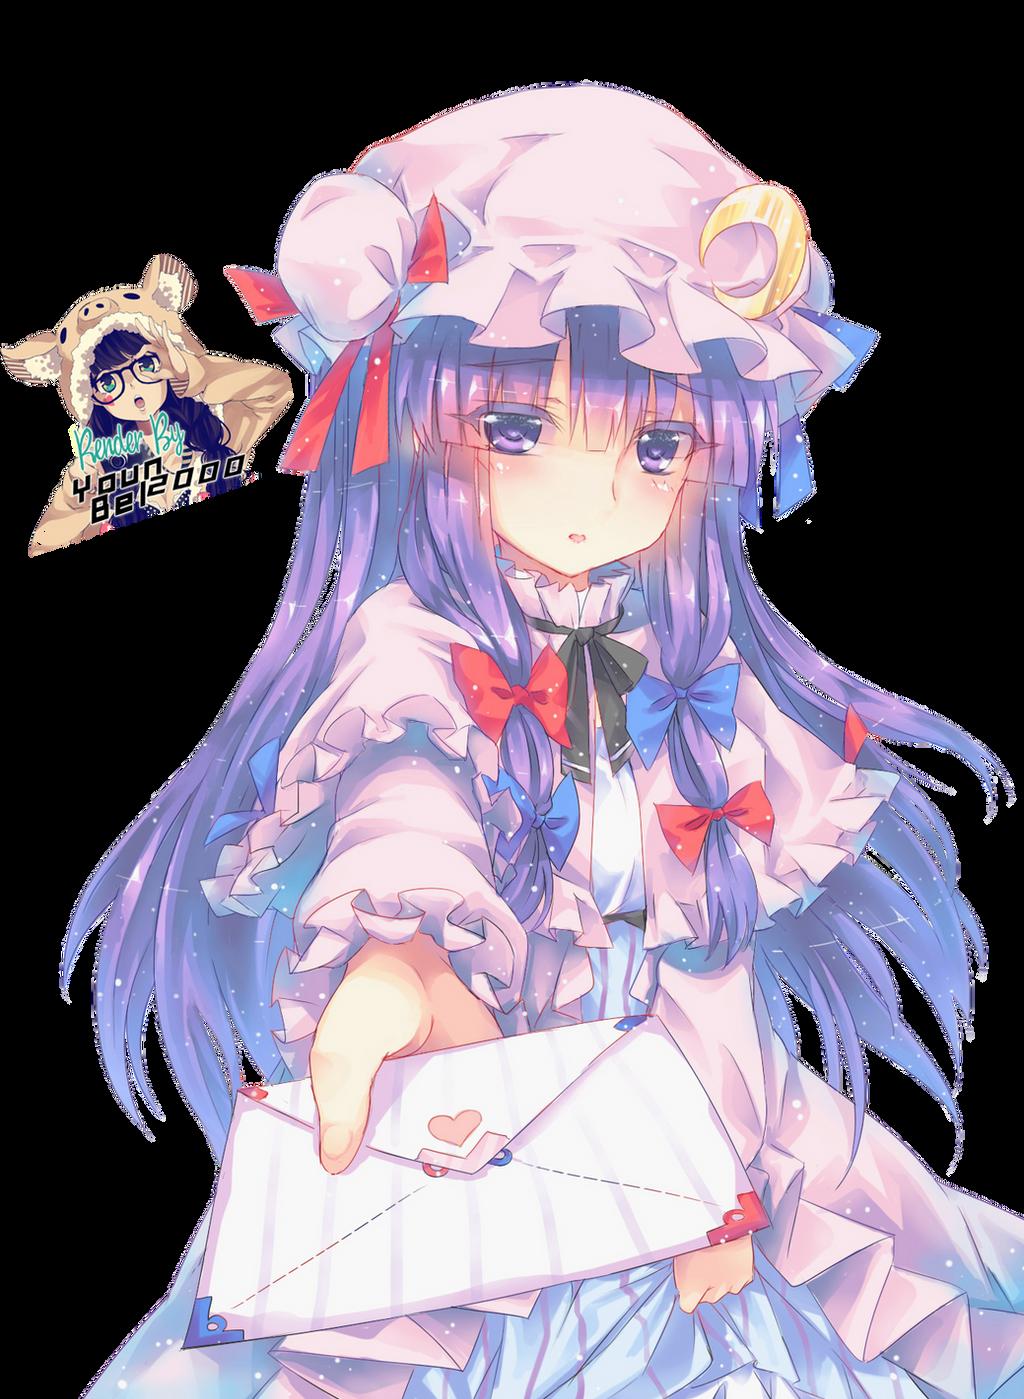 anime love letter renderyounbel2000younbel2000 on deviantart